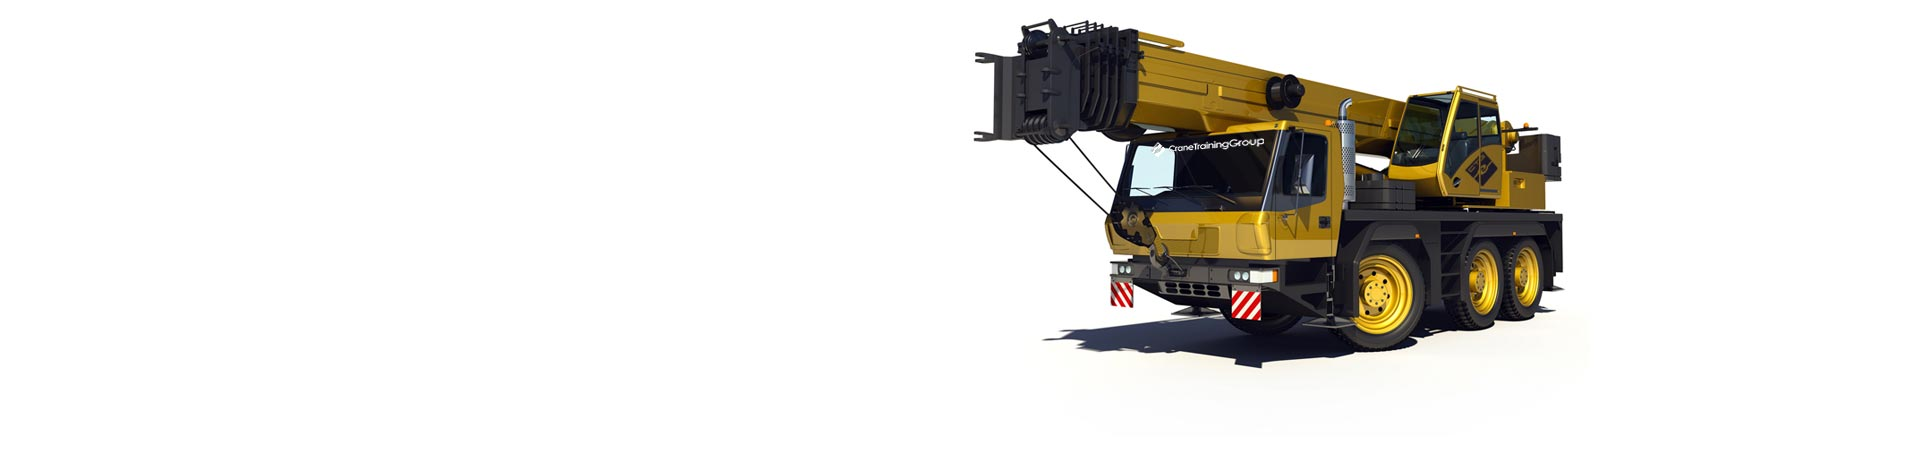 Telescopic Crane Training : Crane training group cic mobile operator